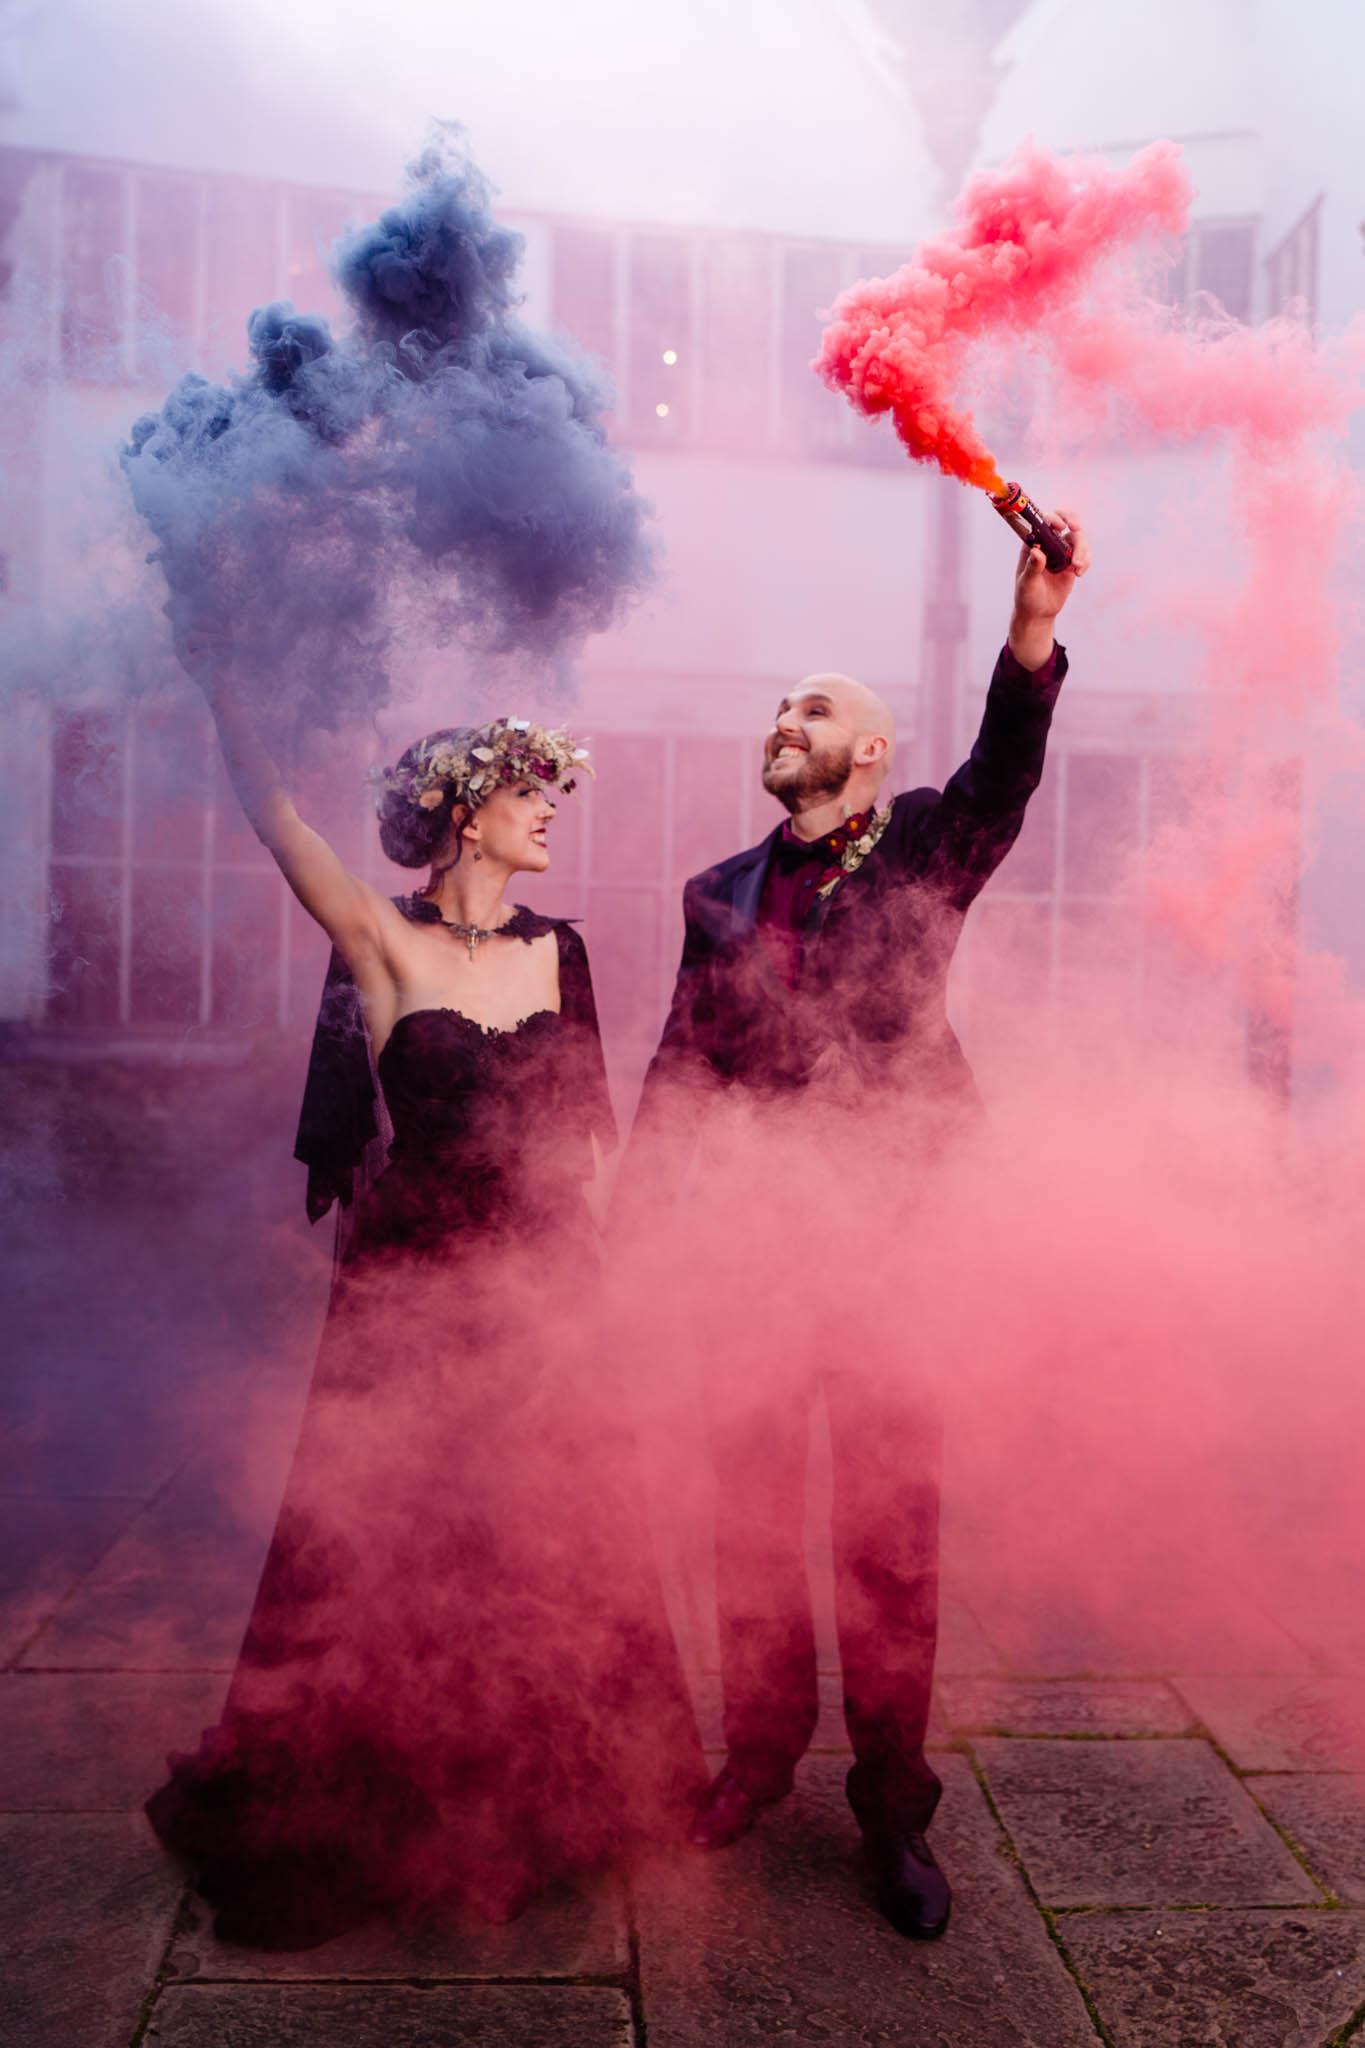 wedding smoke bomb -elegant gothic wedding - gothic wedding